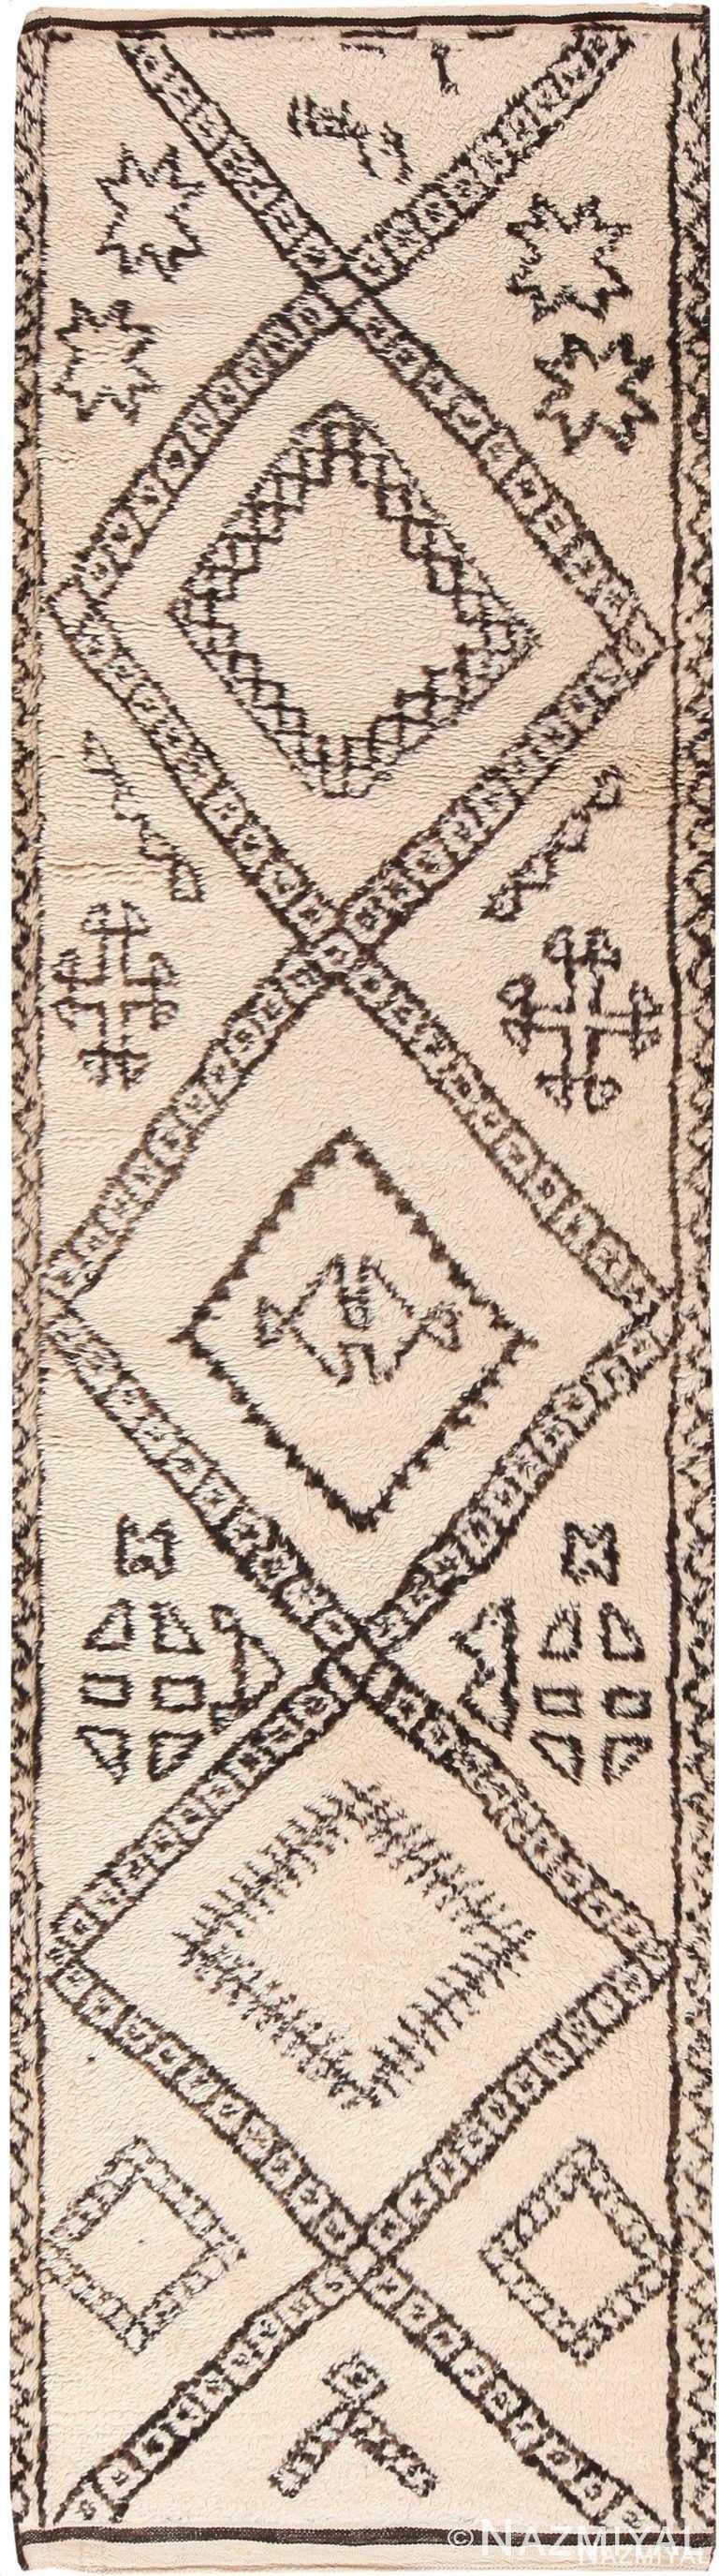 Tribal Design Vintage Moroccan Runner Rug 70921 by Nazmiyal Antique Rugs